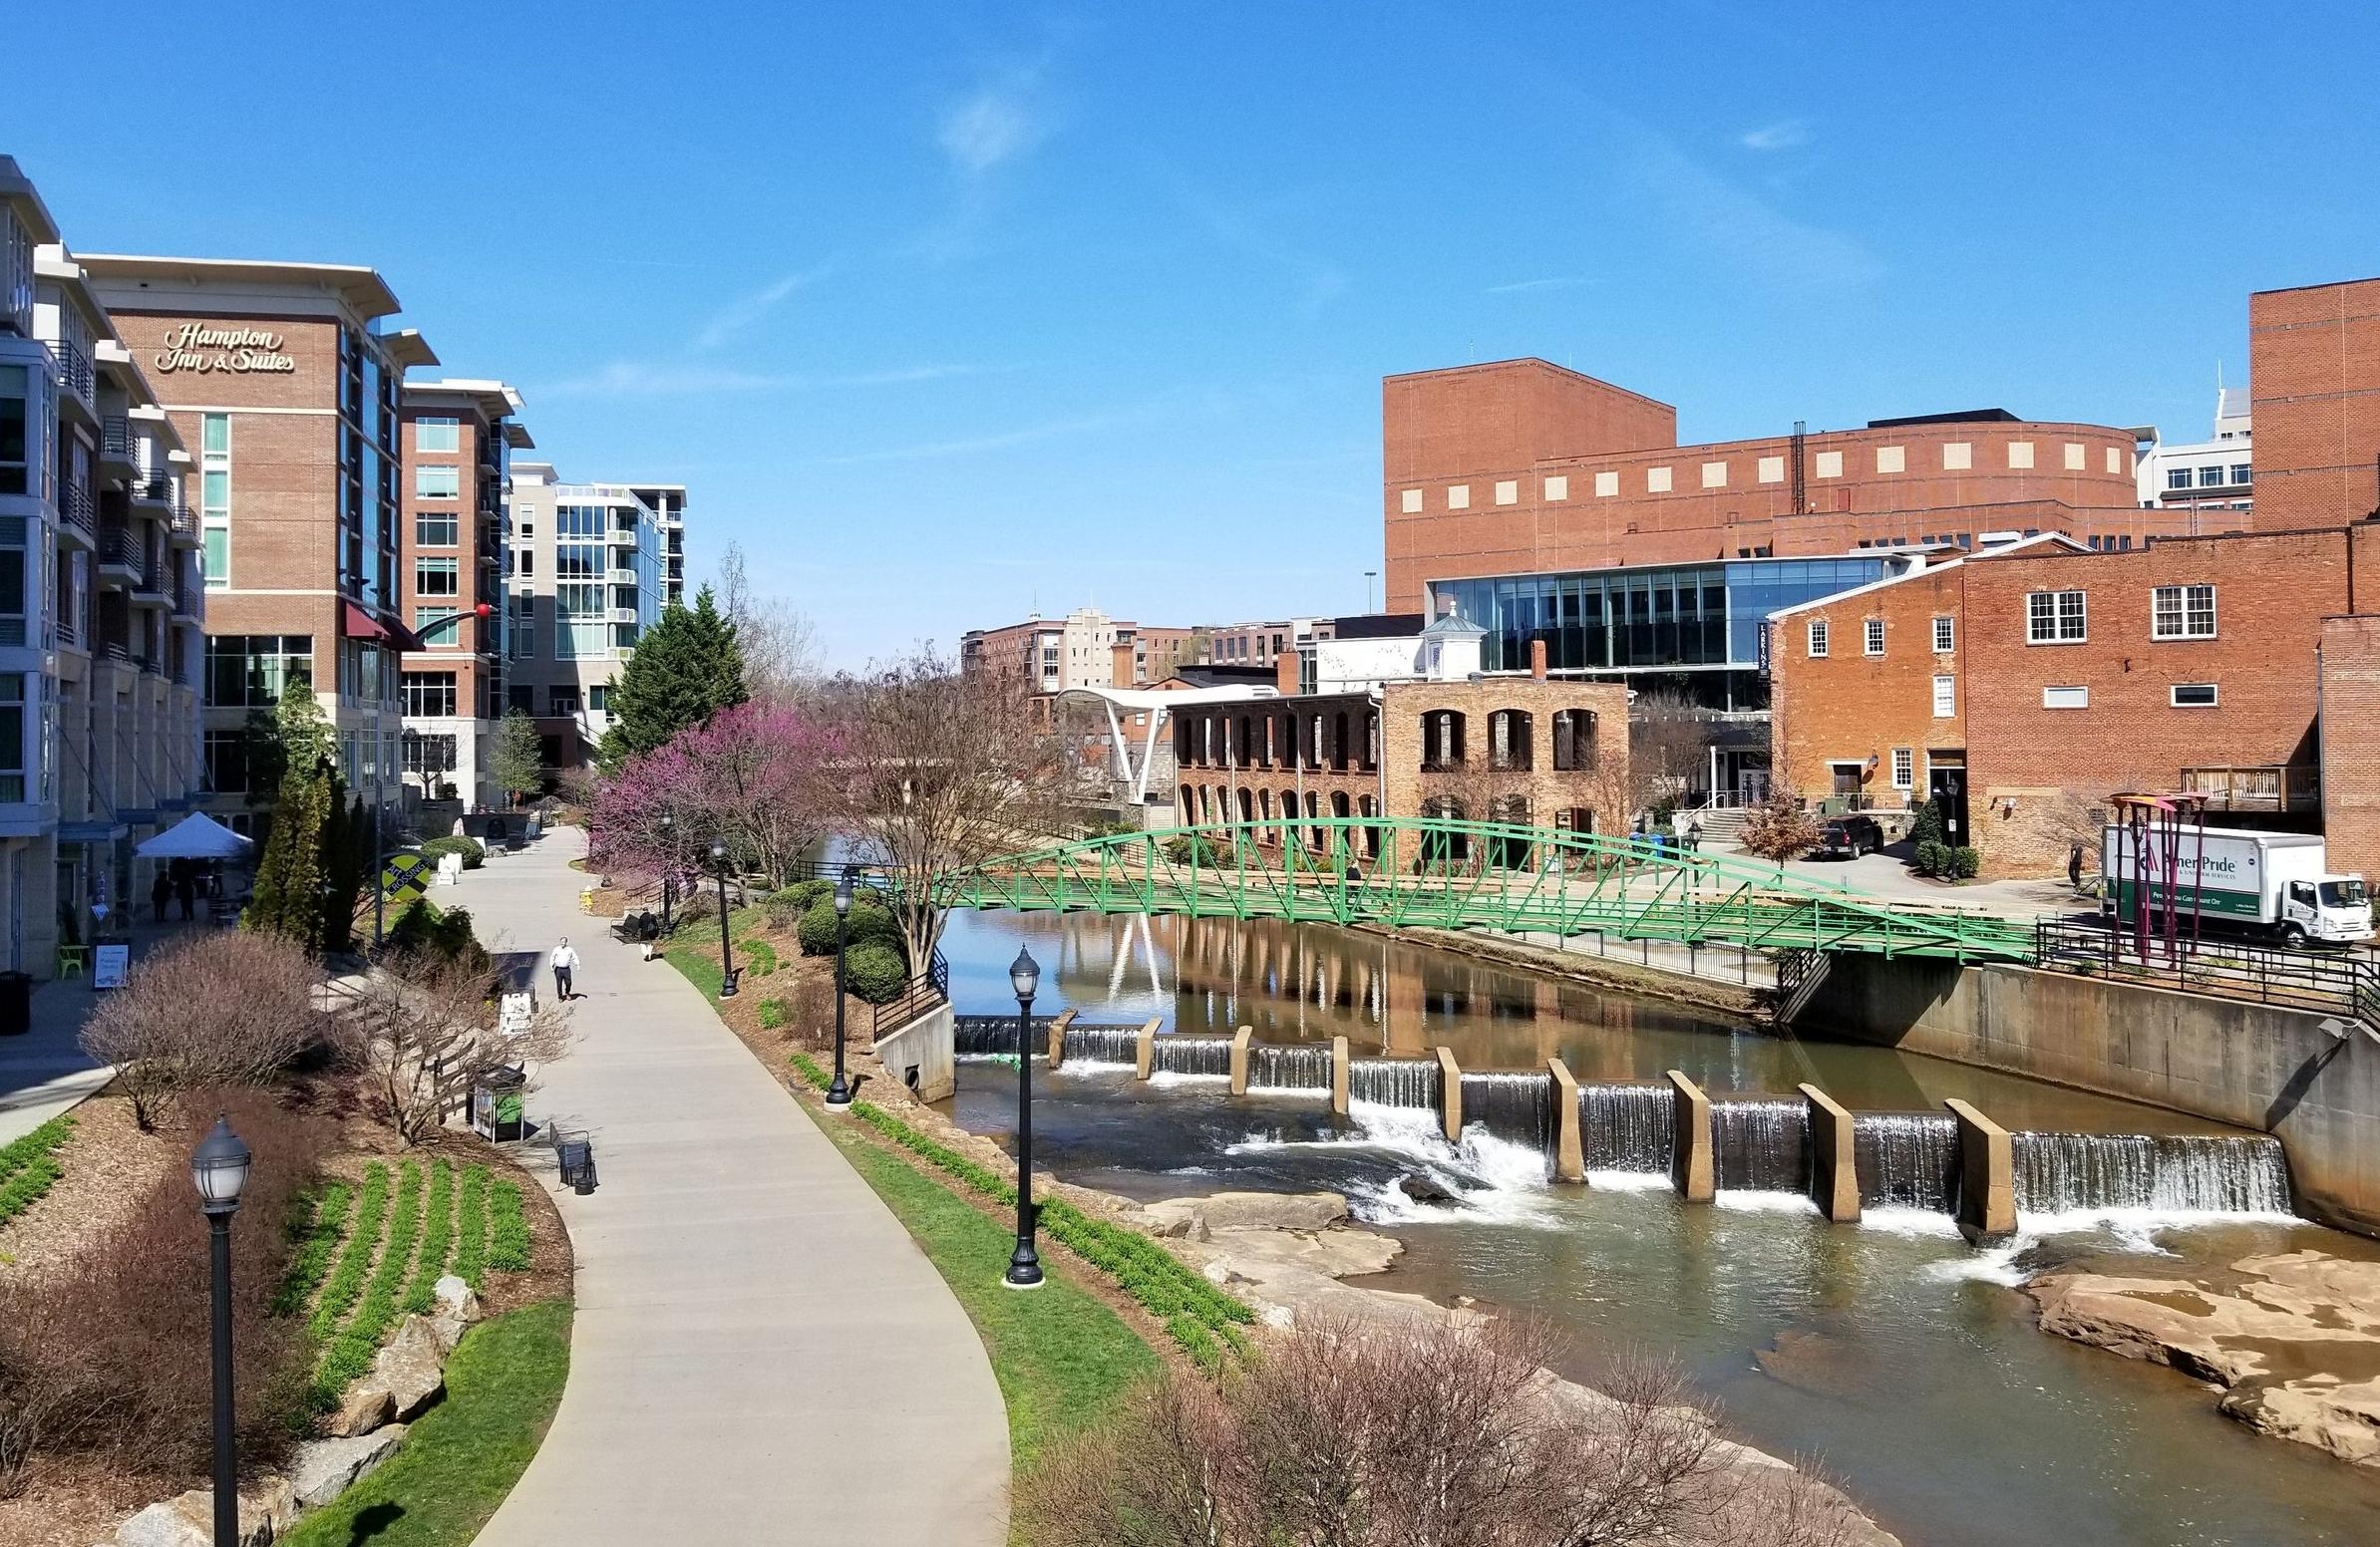 downtown-greenville-sc.jpg